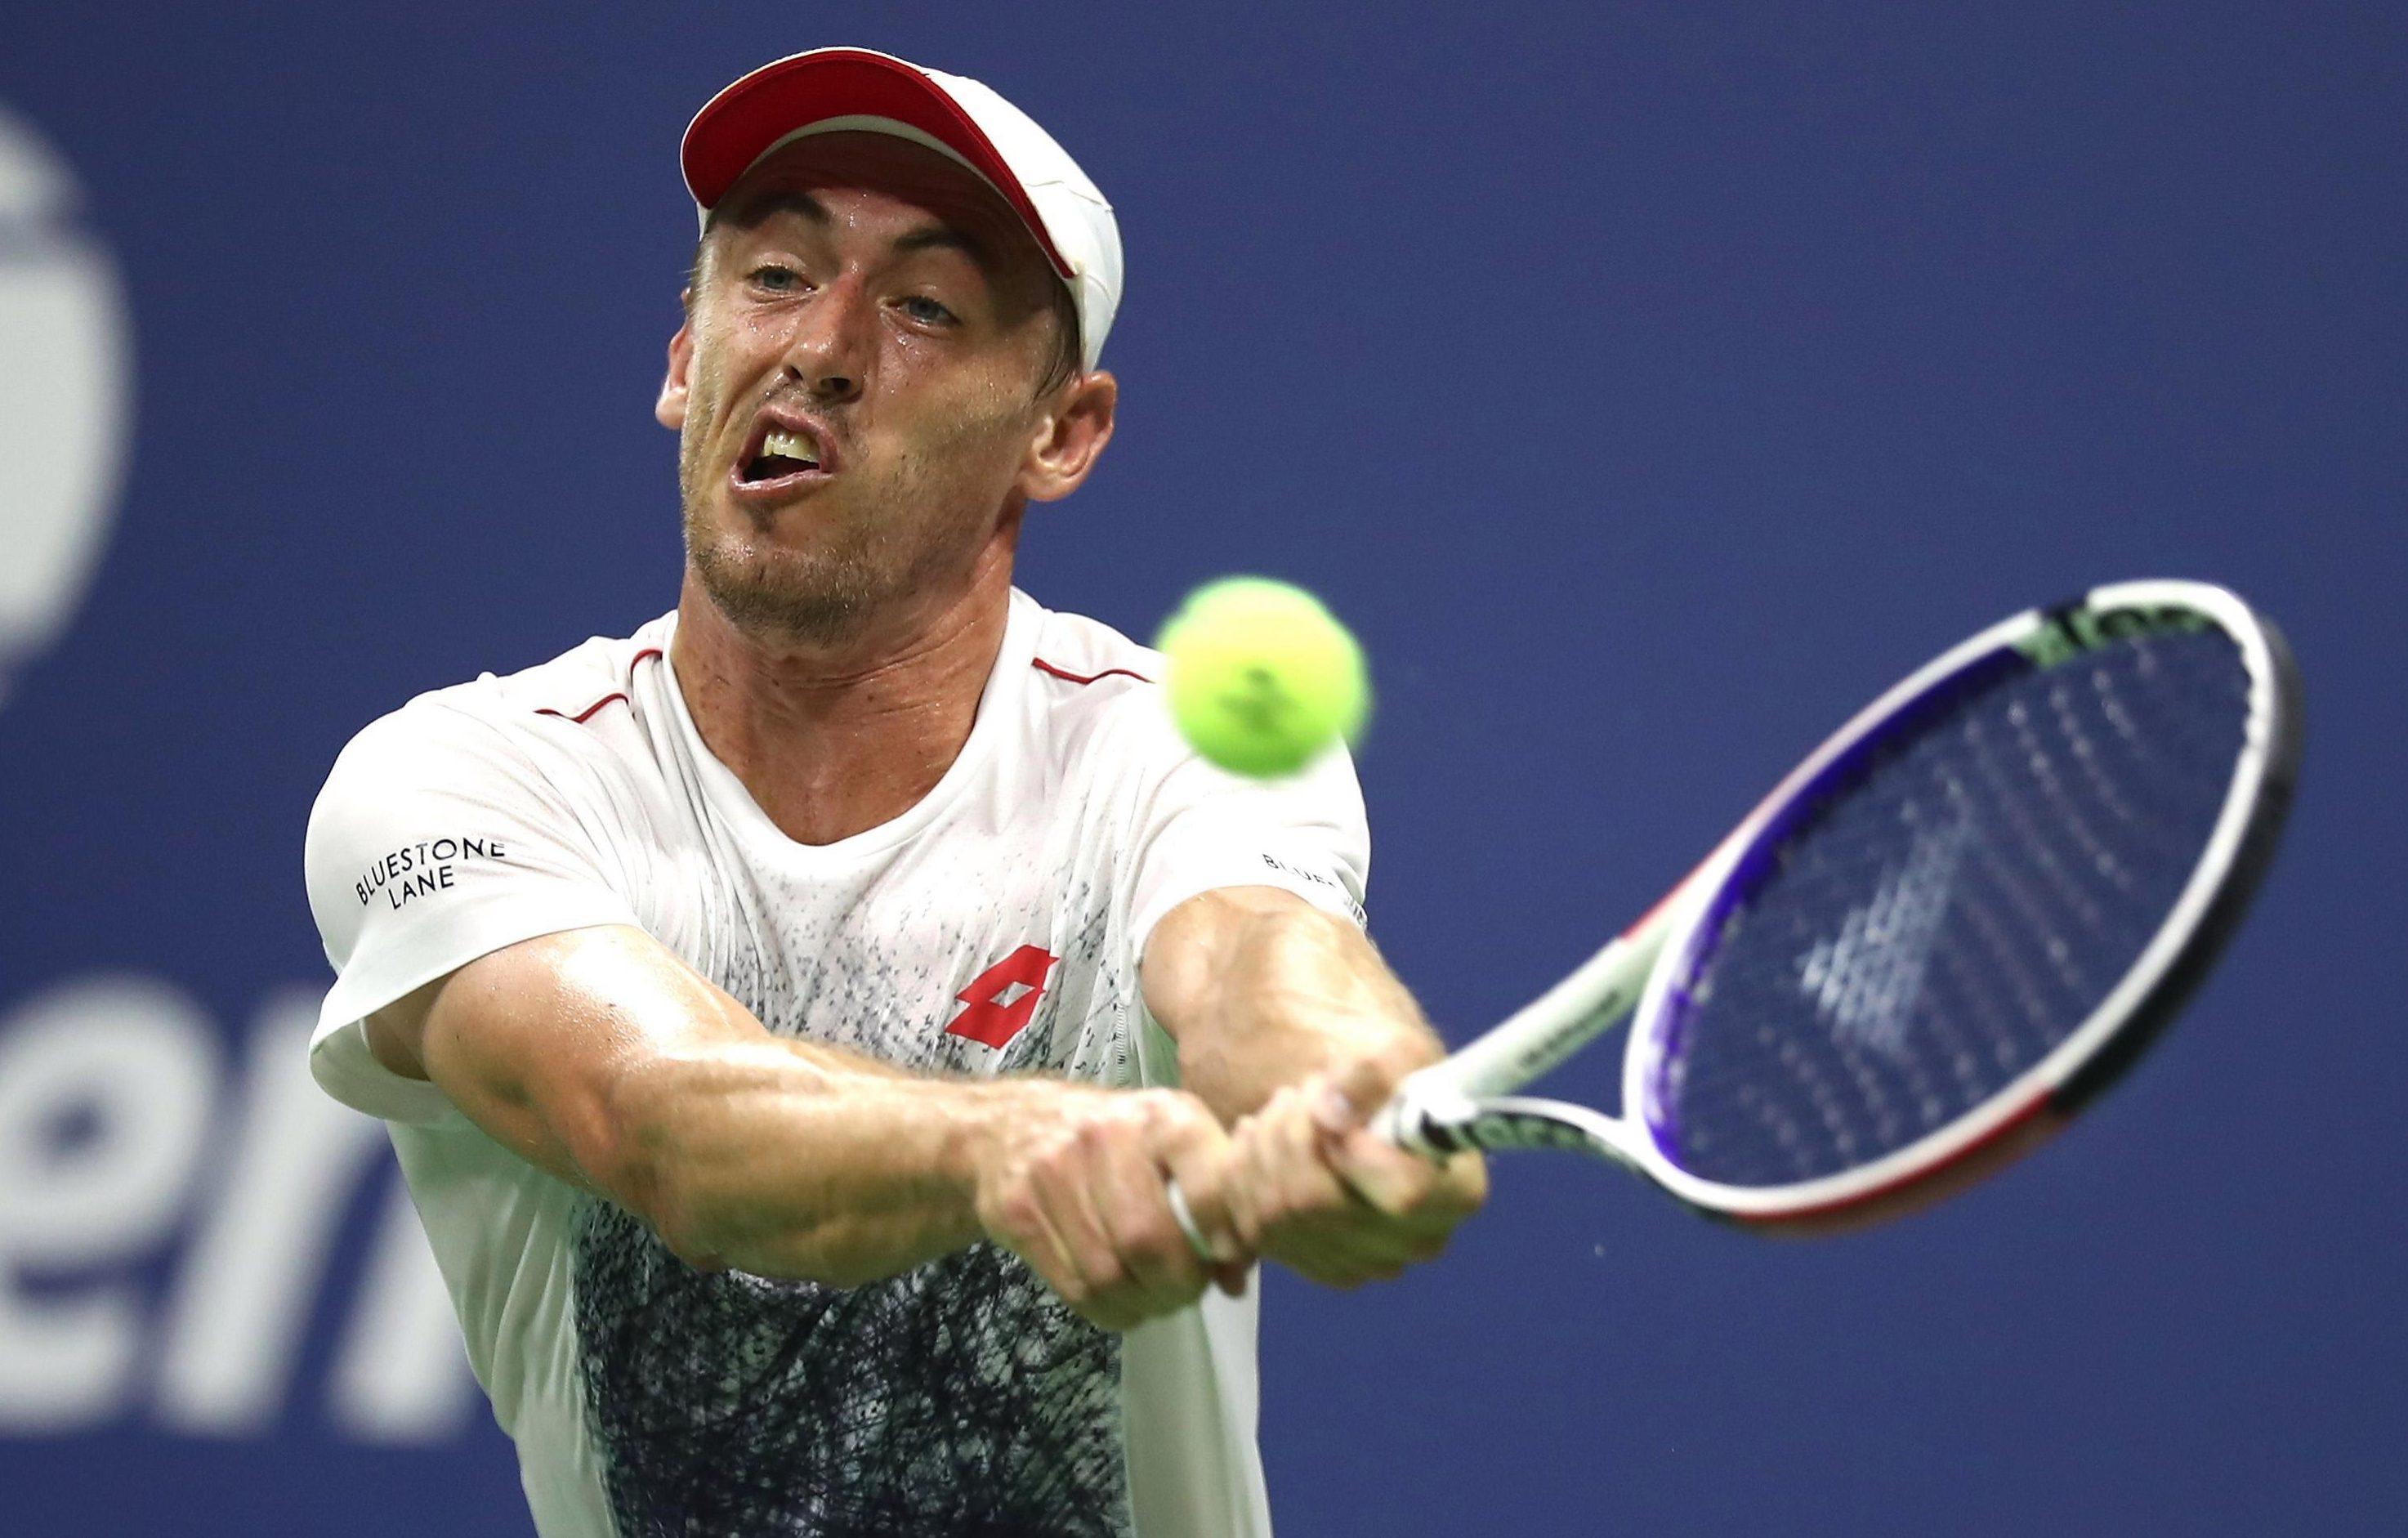 Aussie John Millman insists he can 'build' from his defeat to Novak Djokovic